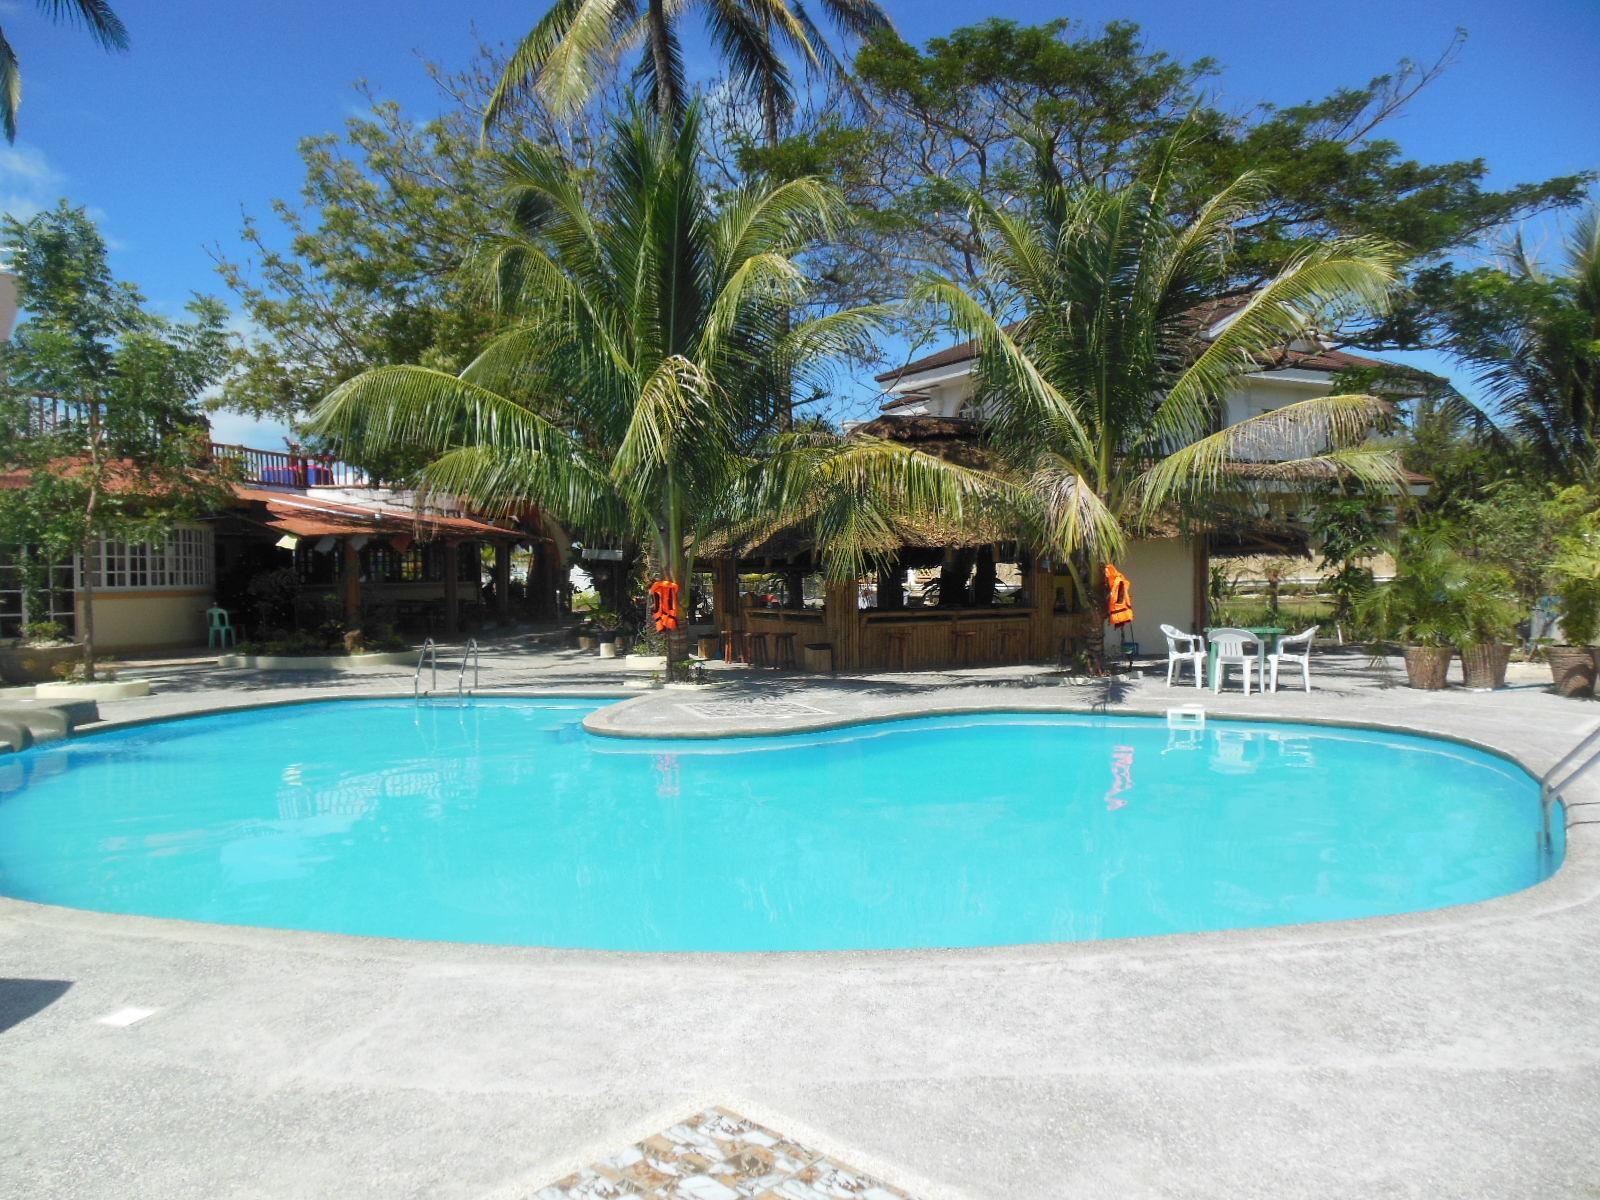 La Parola Orchids Beach Resort Antique Hotels Special